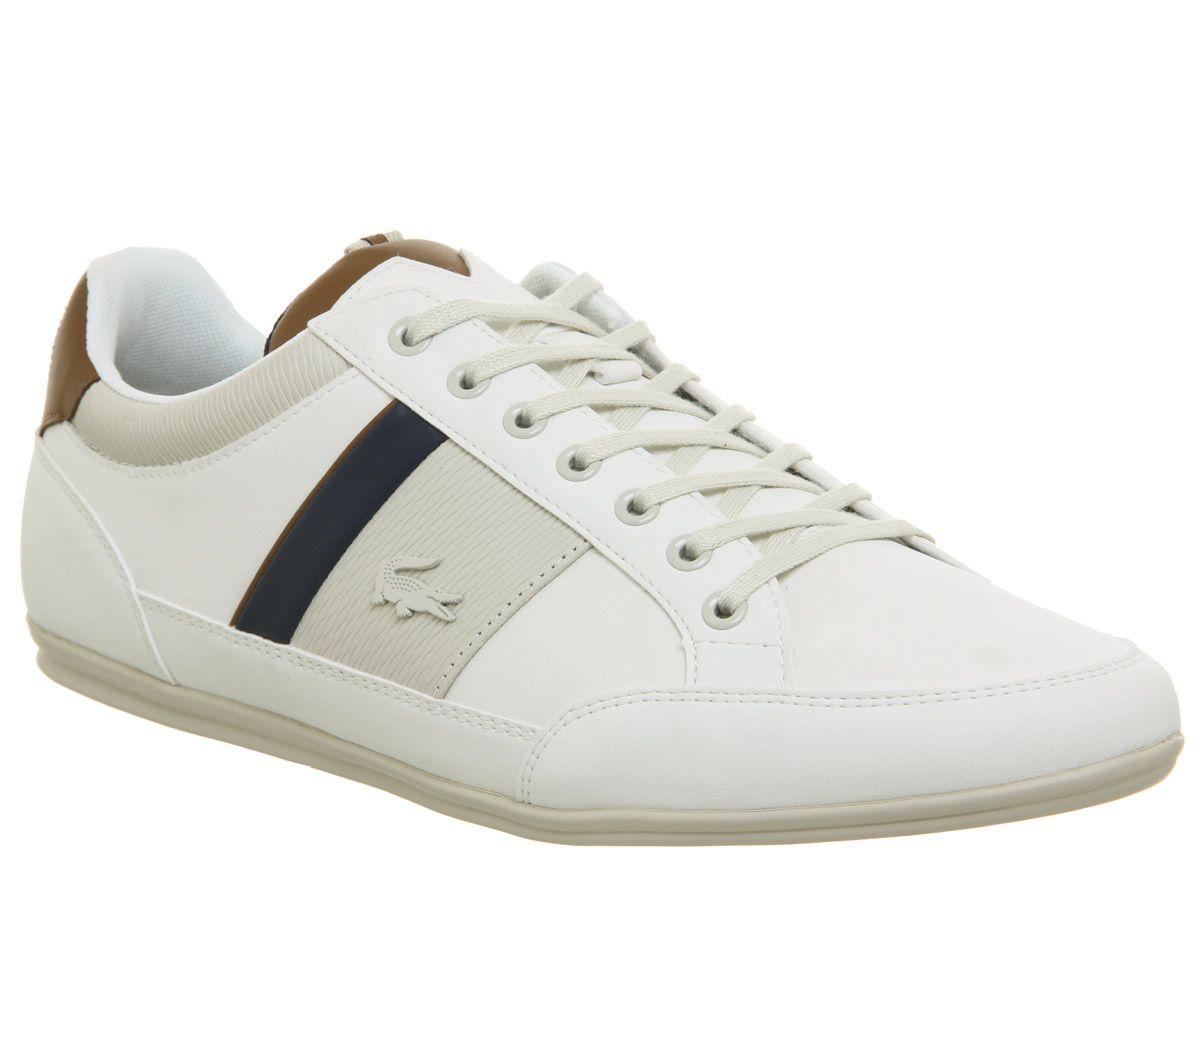 831c6d9e07fc Lacoste Chaymon Trainers Off White - His trainers